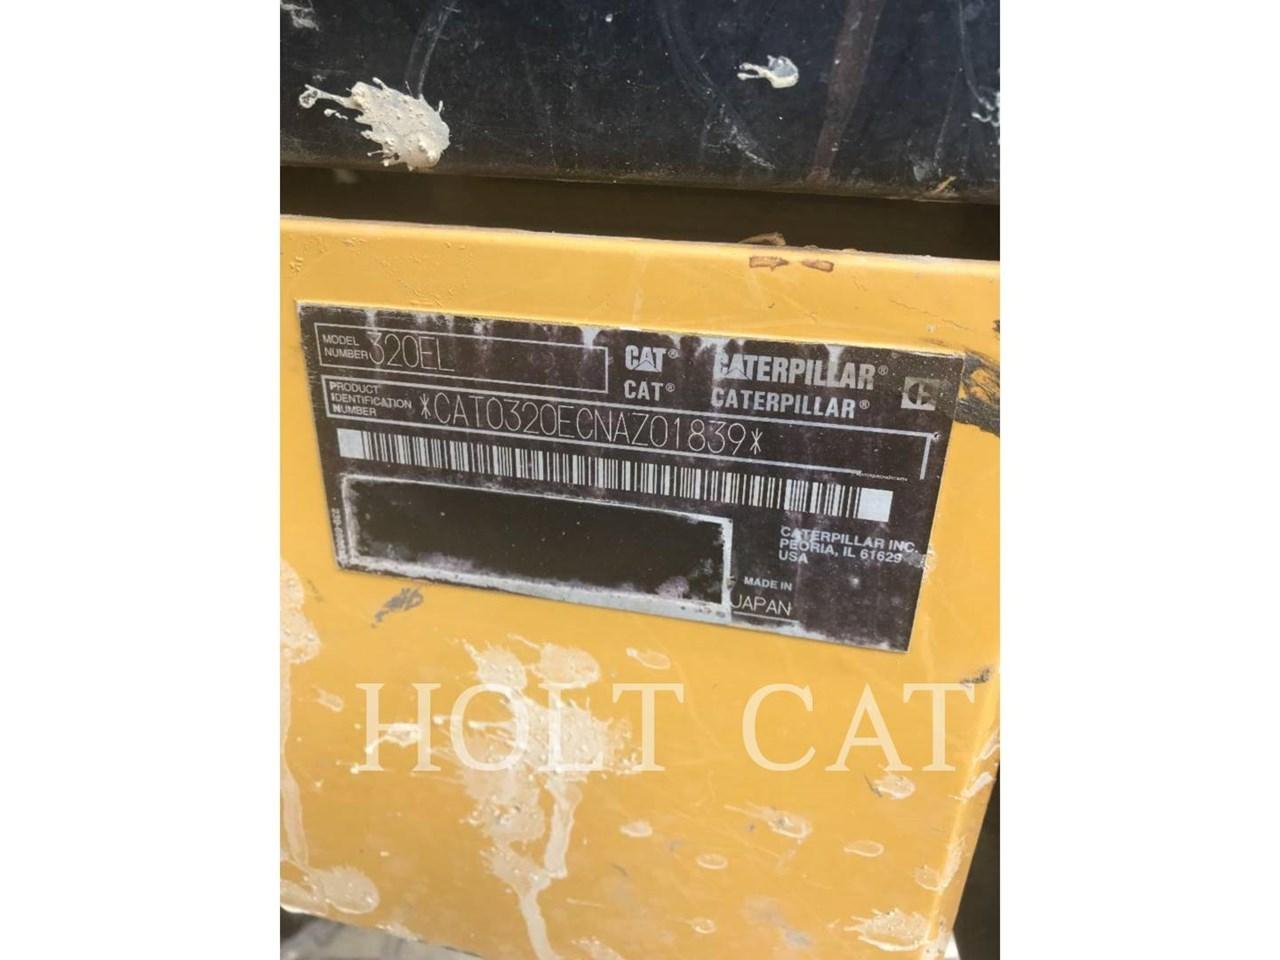 2015 Caterpillar 320EL TC Image 5